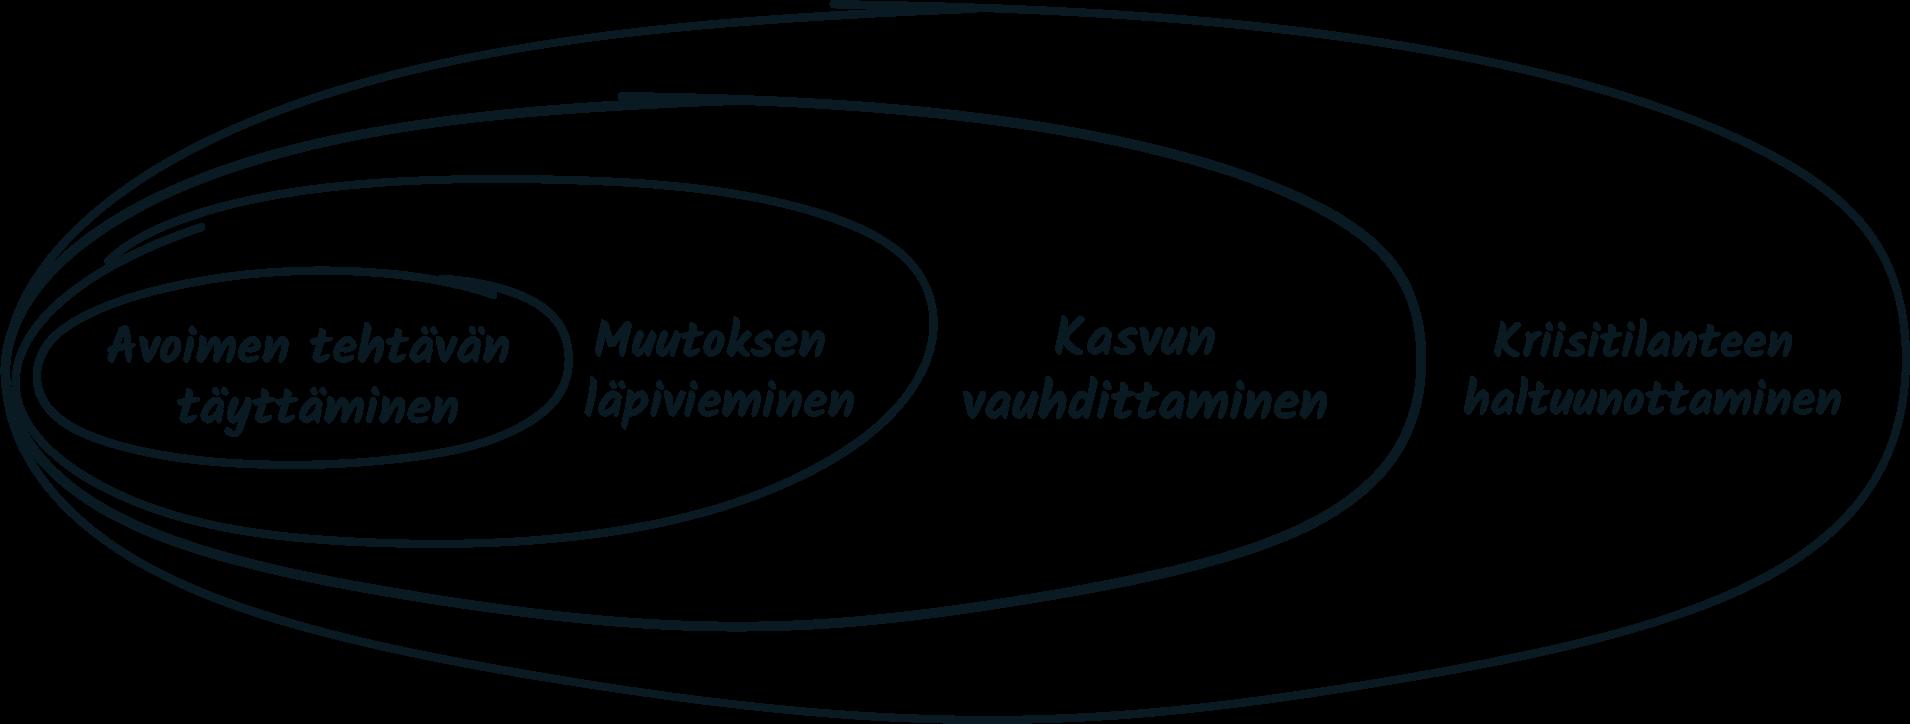 ellipser-nordic-interim-finska-blue.png